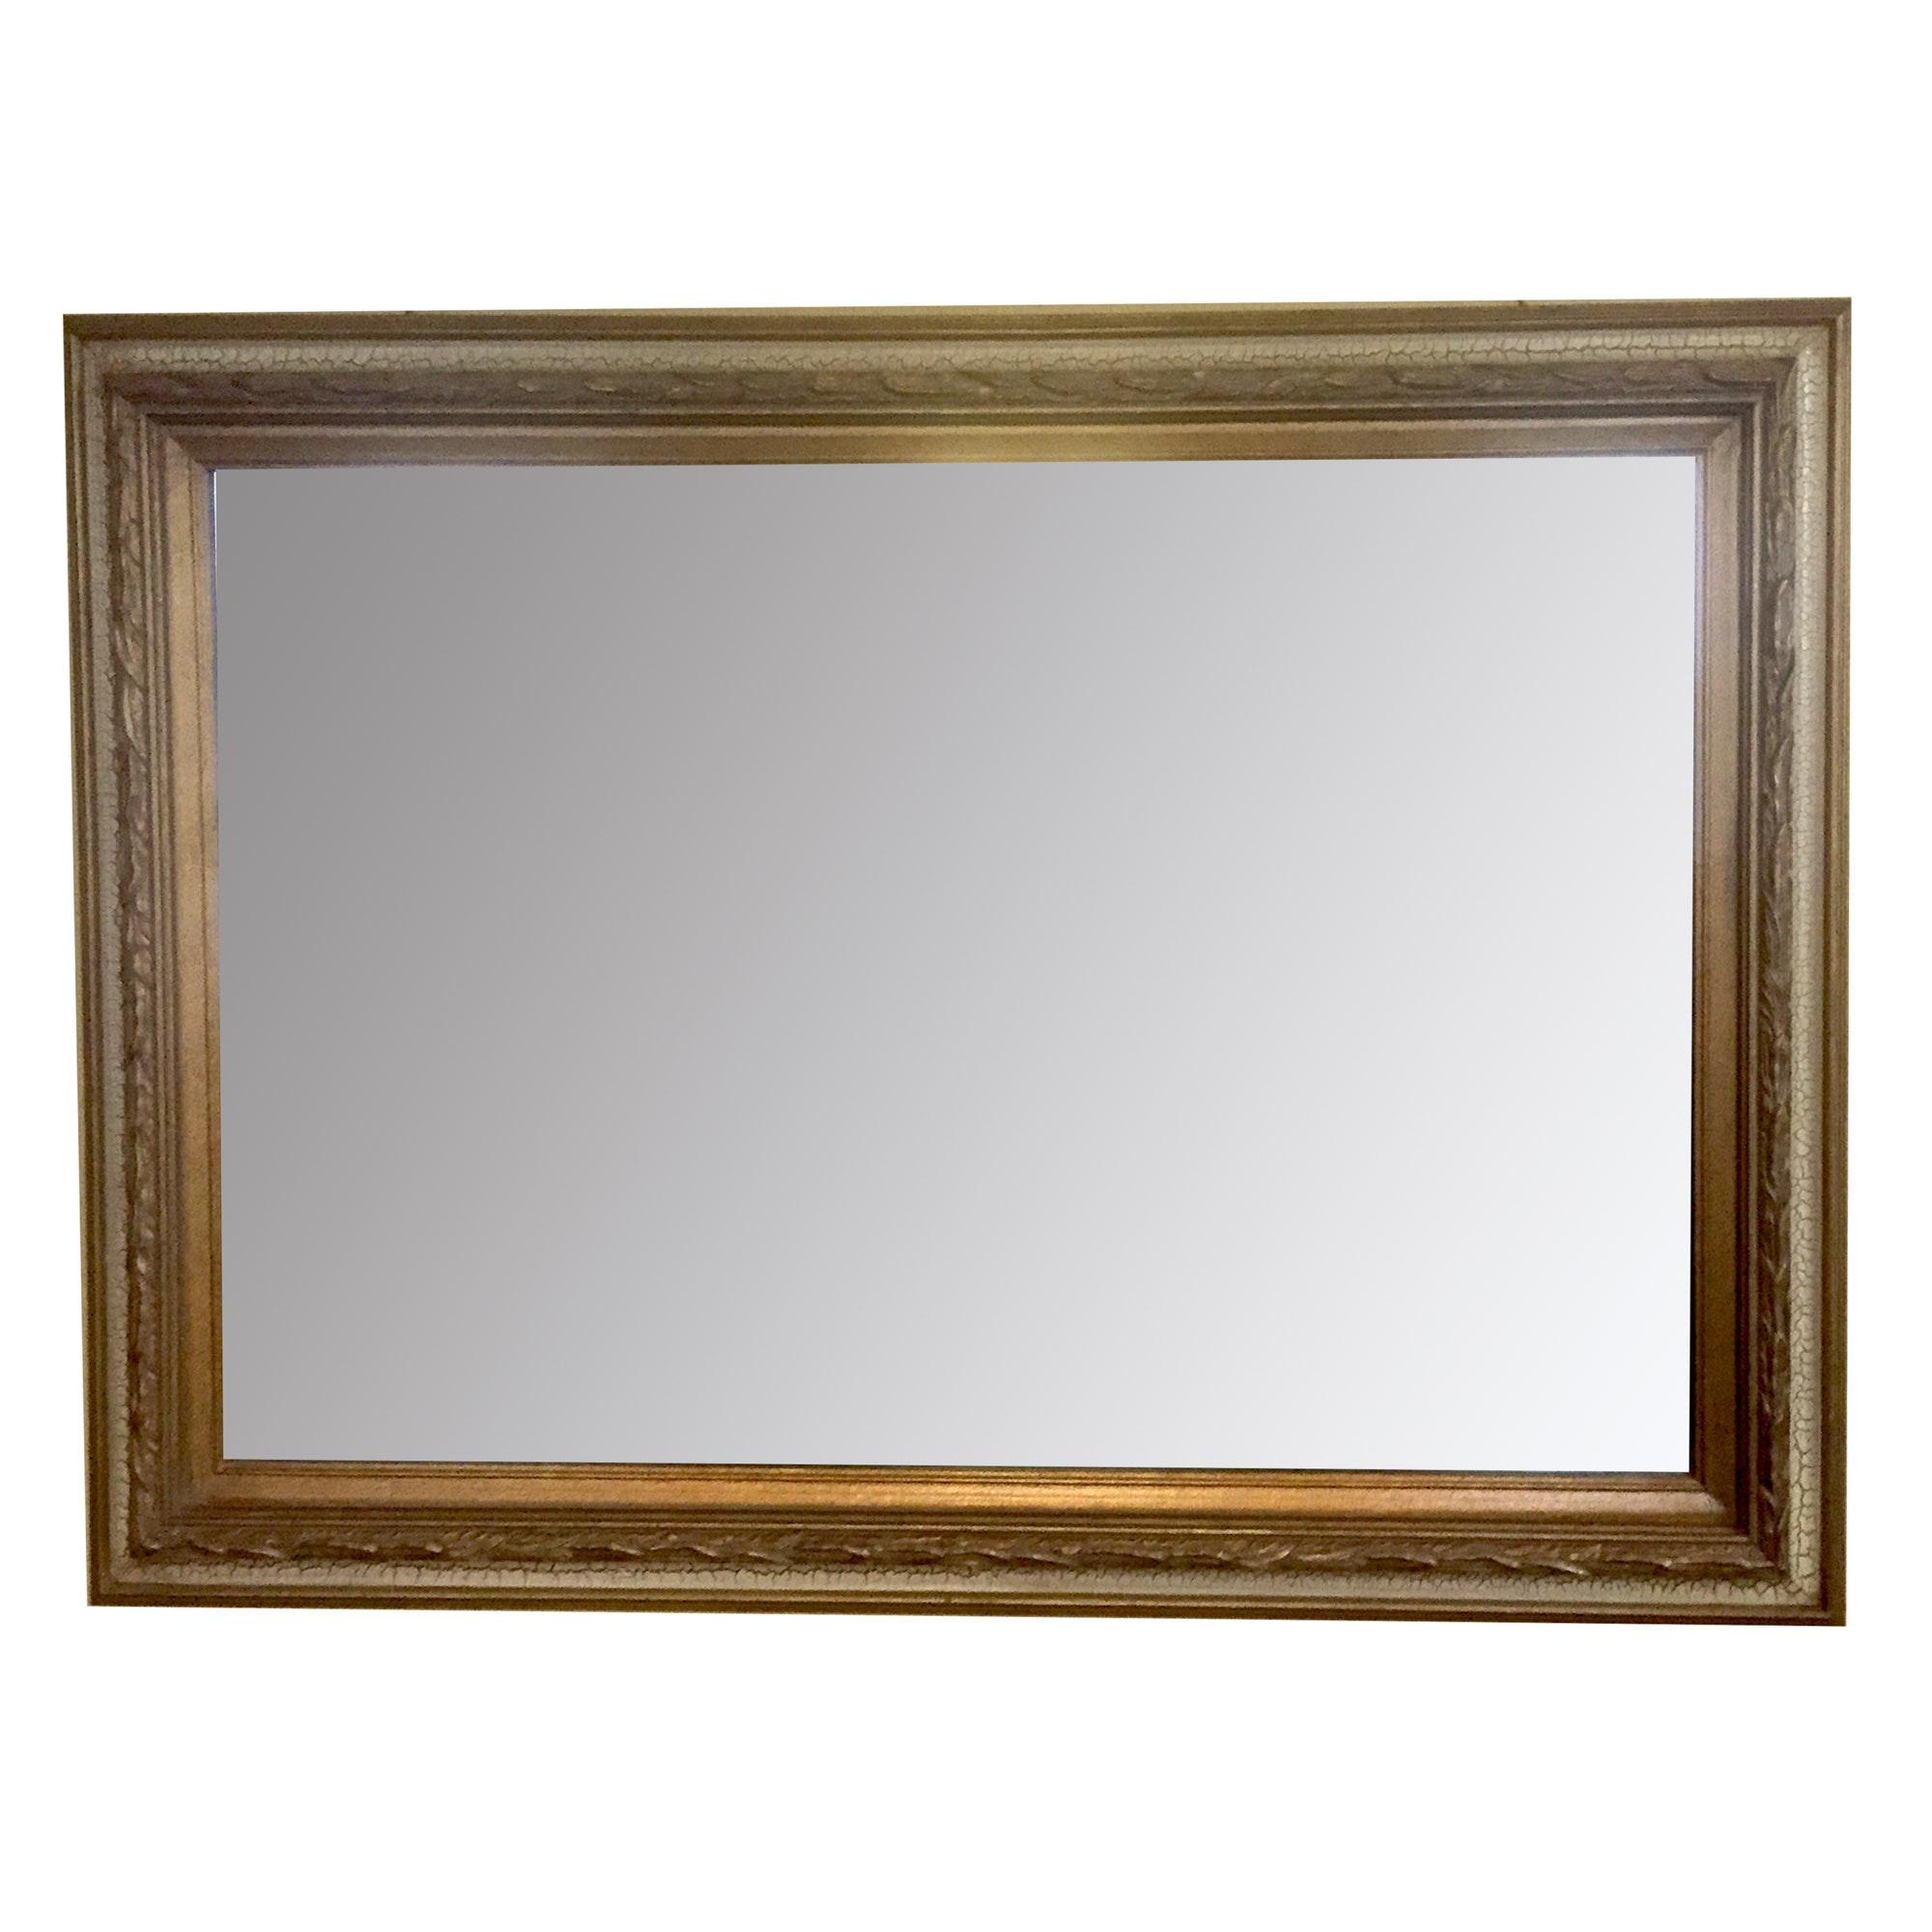 Large Beveled Satin Wood Wall Mirror